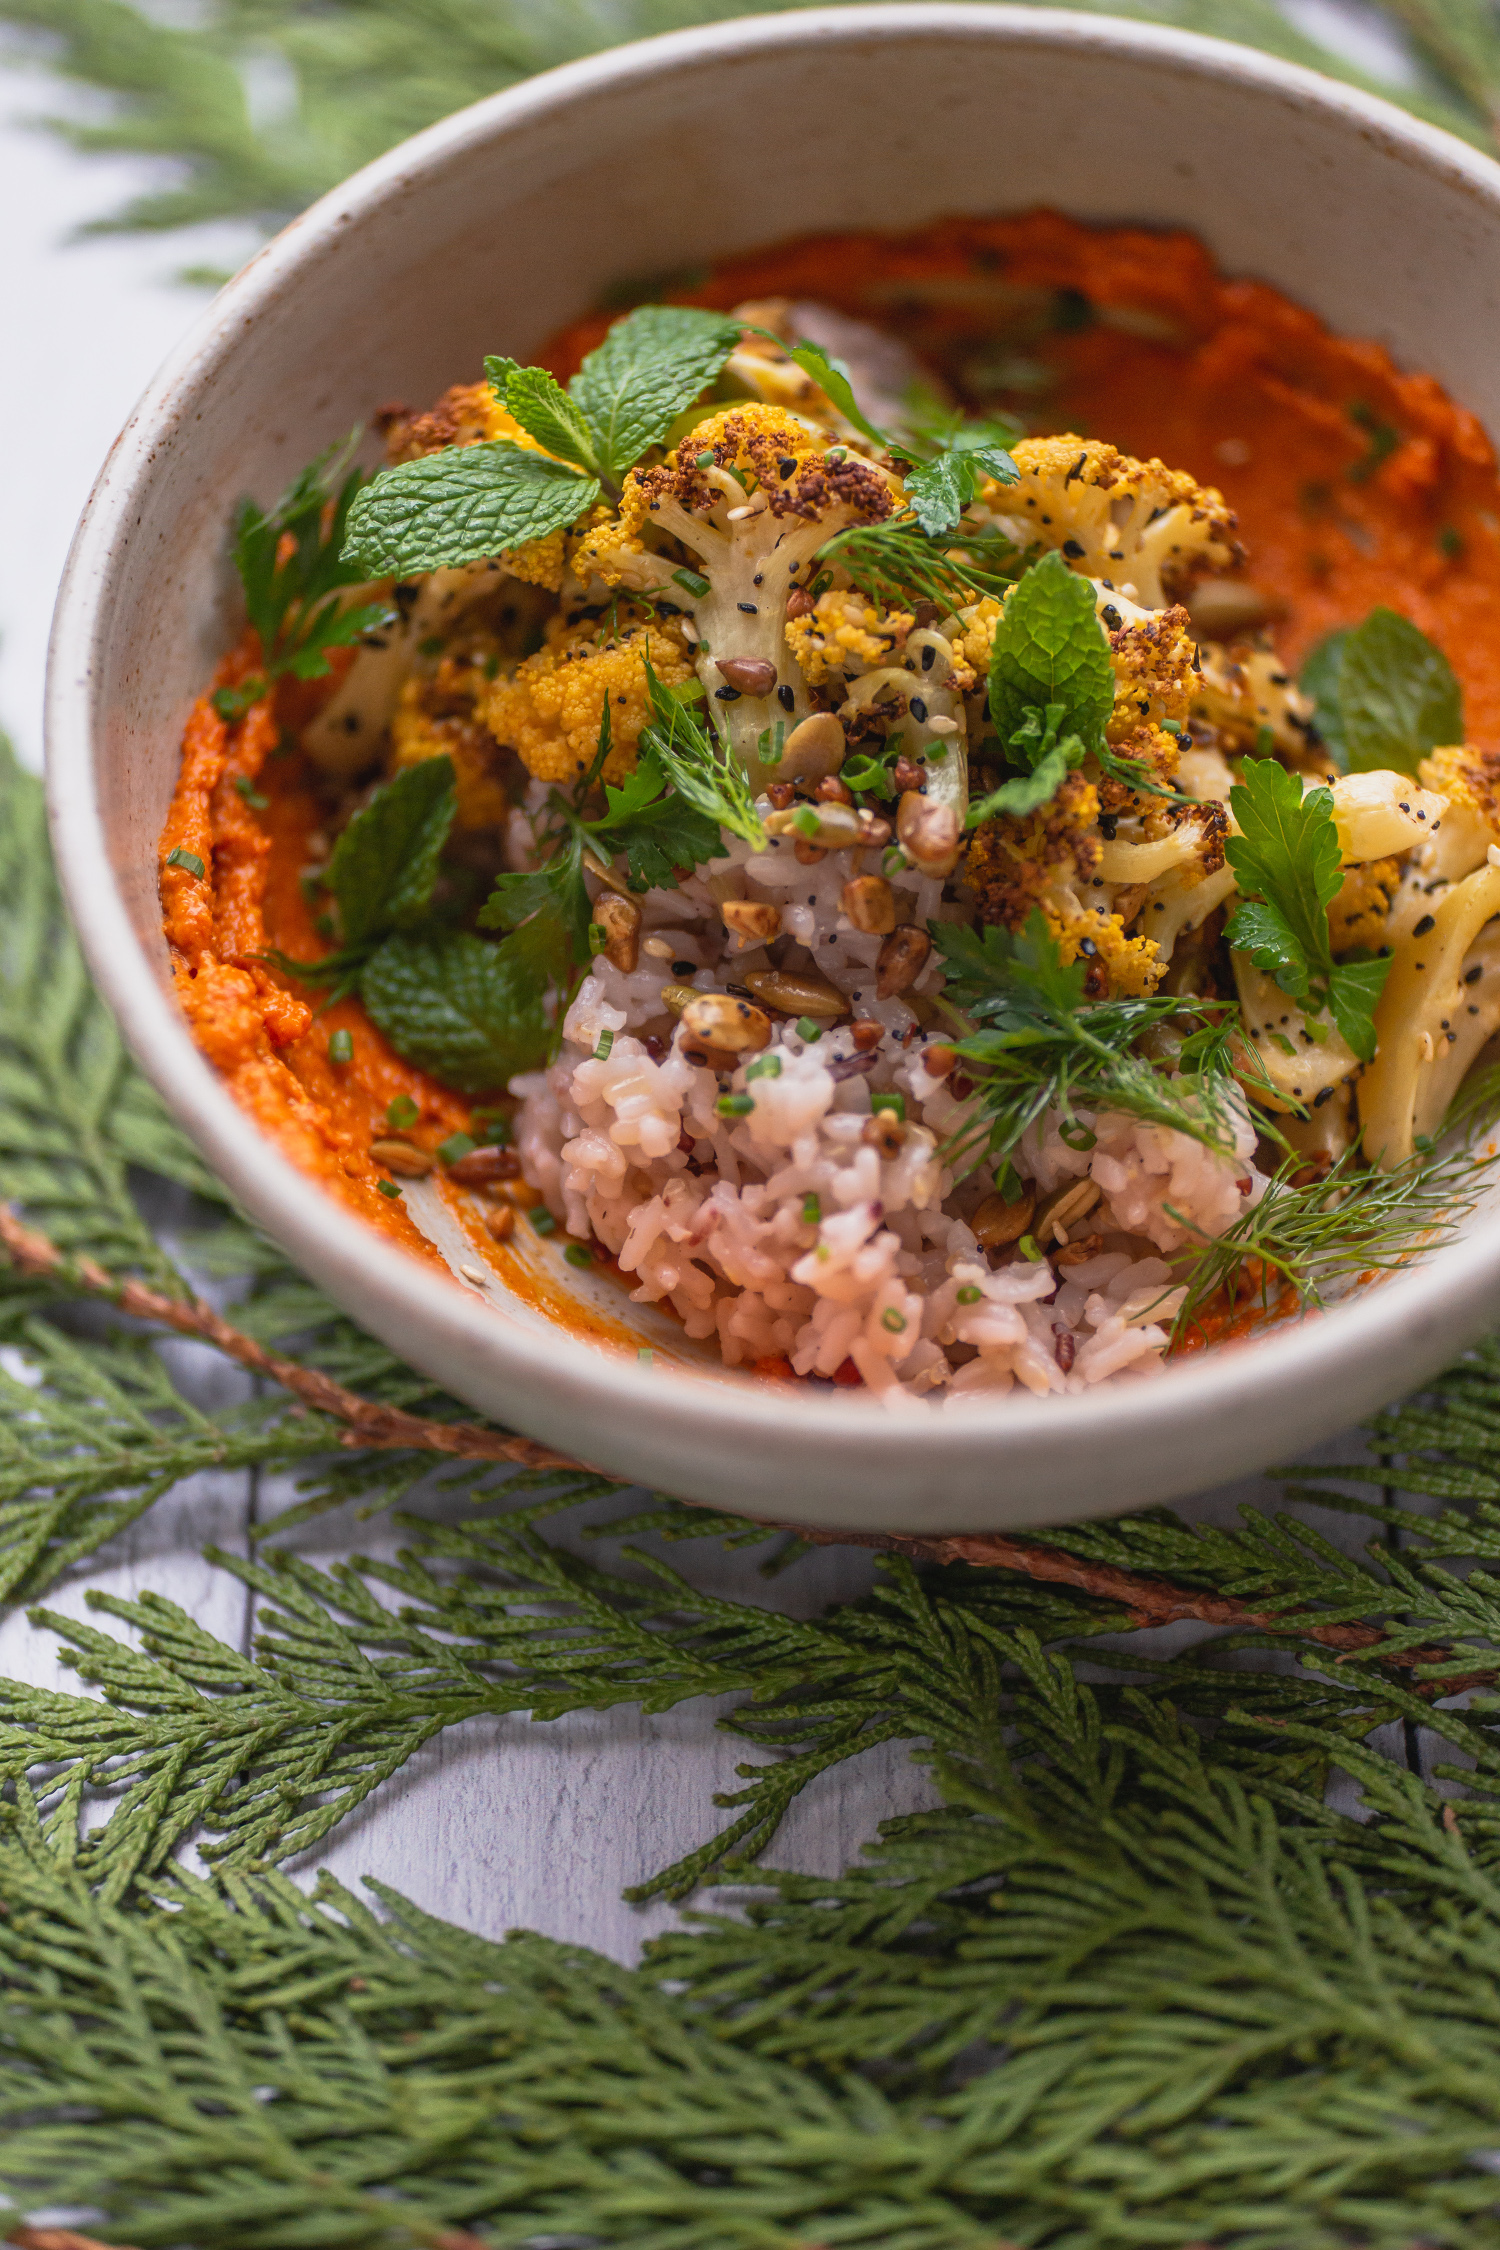 Cauli-Carrot-Rice Side